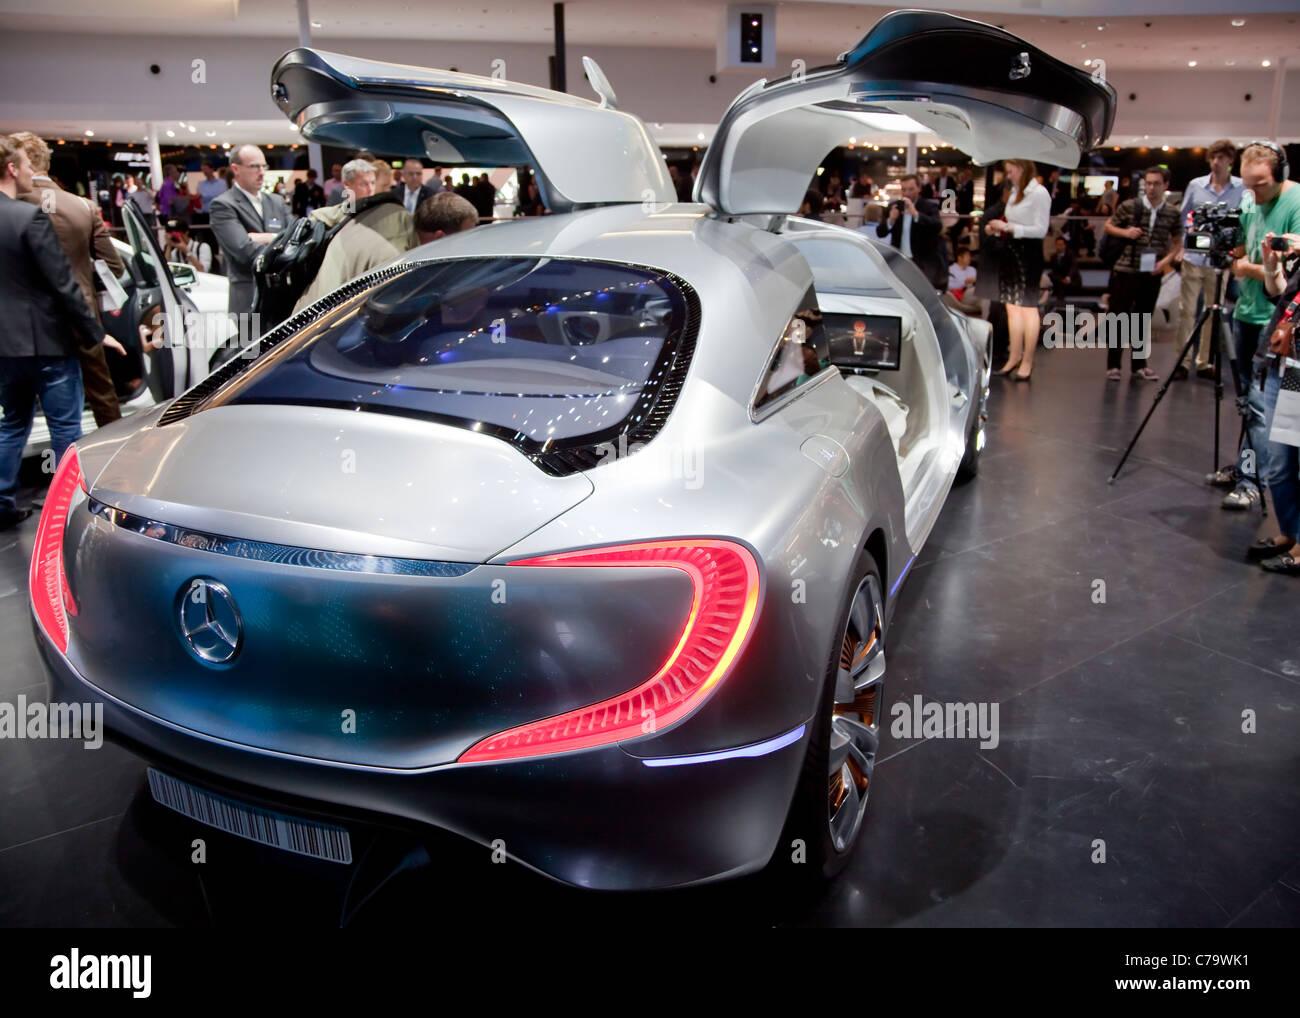 New Mercedes Benz Concept Car F125 On The Iaa 2011 International